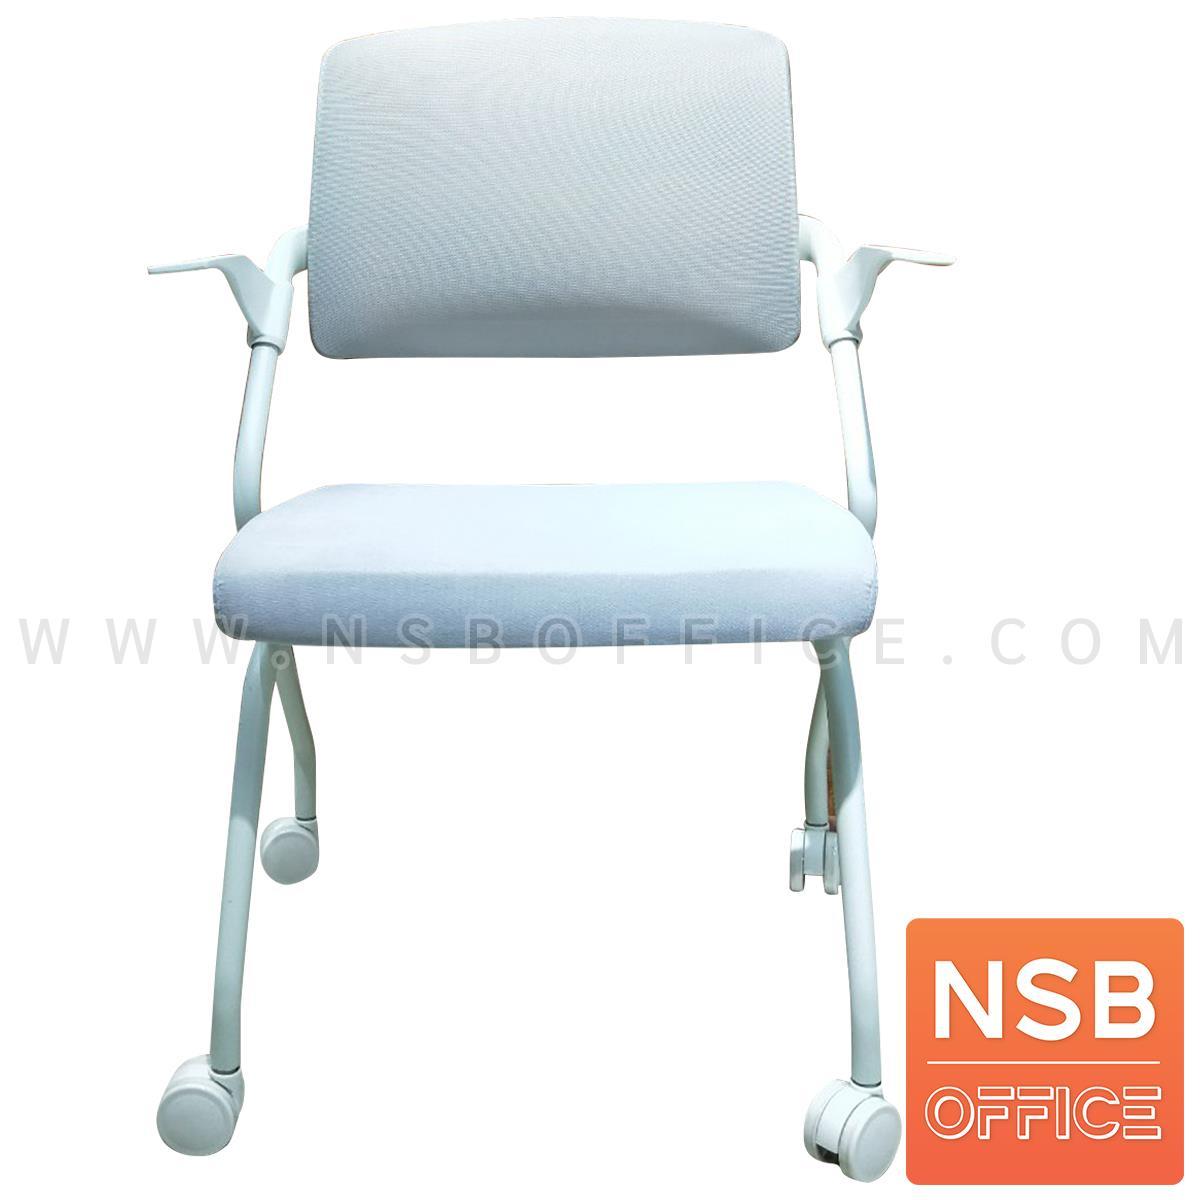 B05A182:เก้าอี้อเนกประสงค์หุ้มผ้า รุ่น Shippie (ชิปปี้)  โครงขาเหล็ก